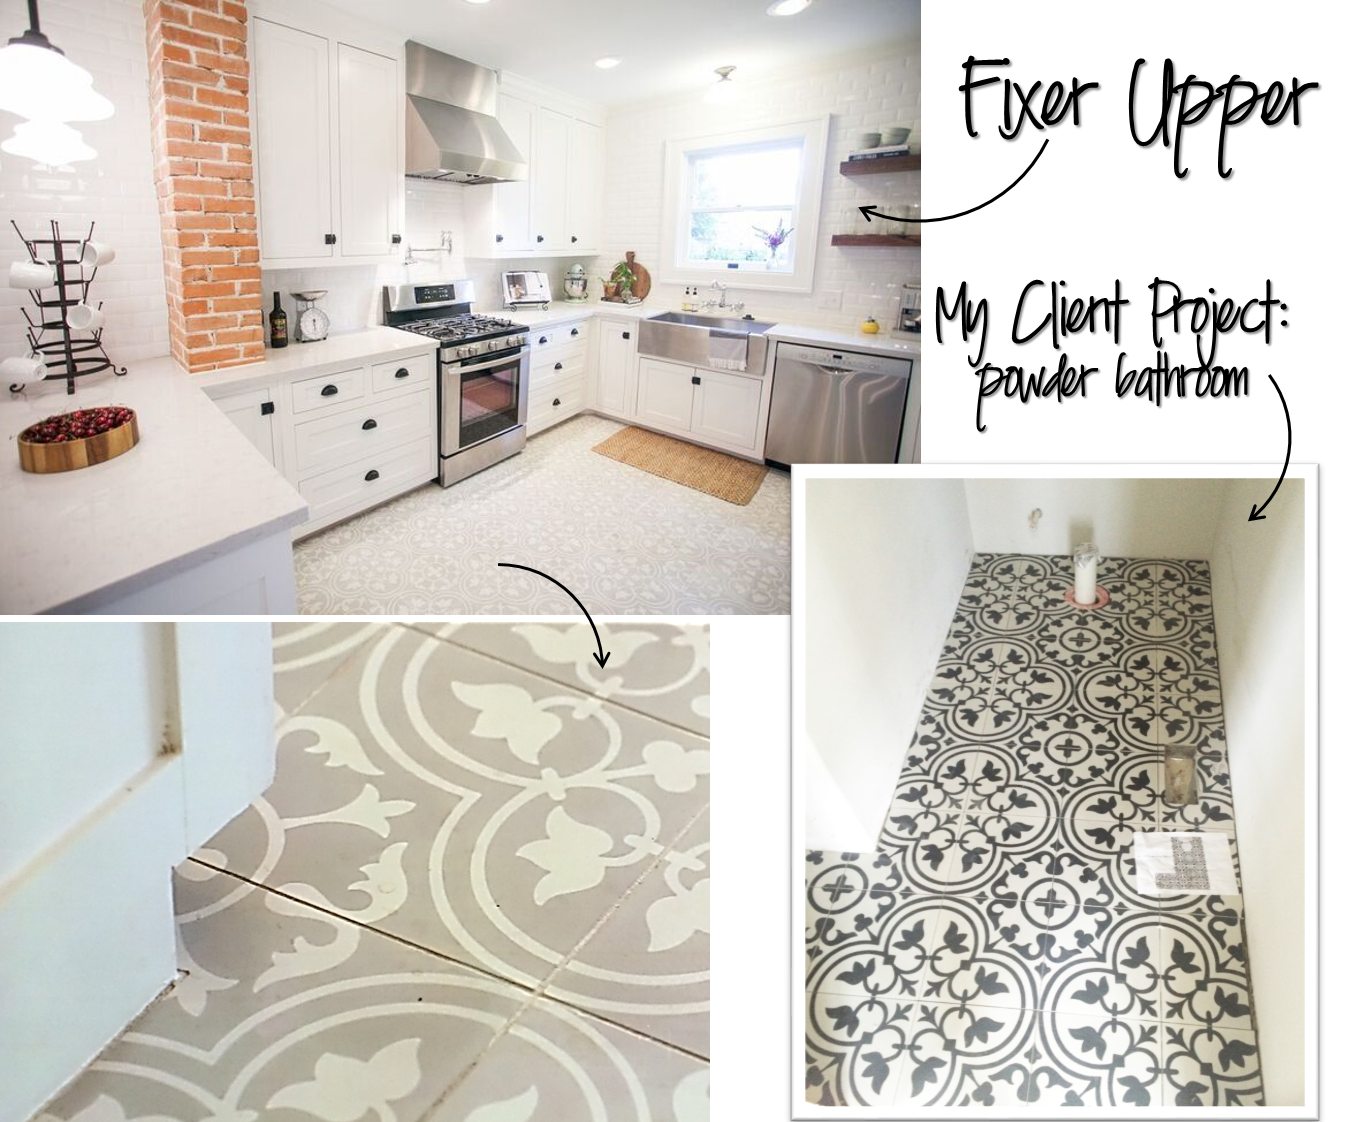 Fixer upper kitchen backsplash ideas - 17 Best Images About Kitchen Ideas On Pinterest Gray Kitchens Yellow Kitchens And Islands